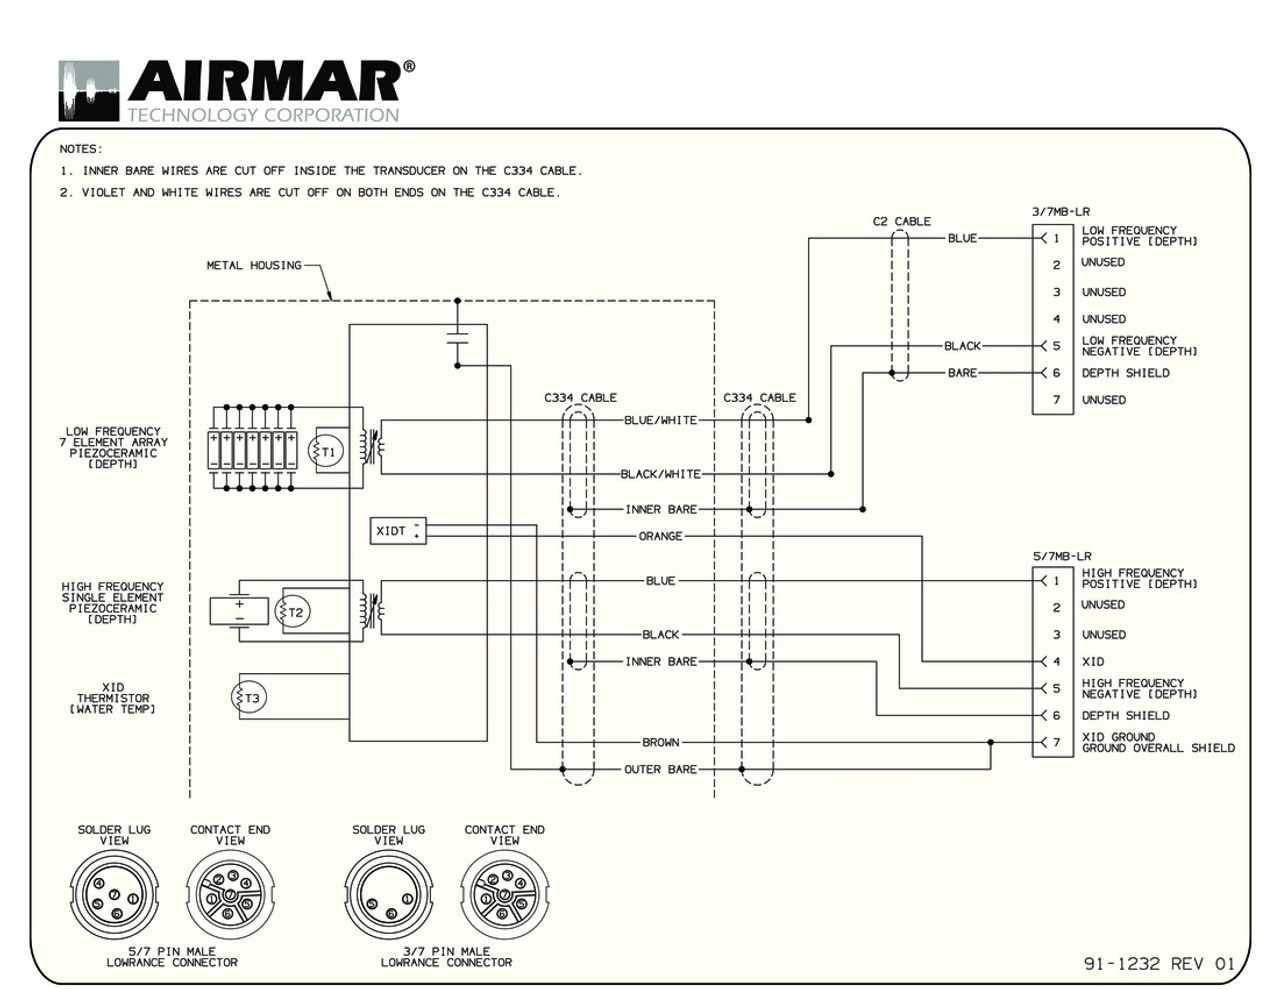 lowrance wiring schematic airmar wiring diagram navico non diplex 1kw blue bottle marine  airmar wiring diagram navico non diplex